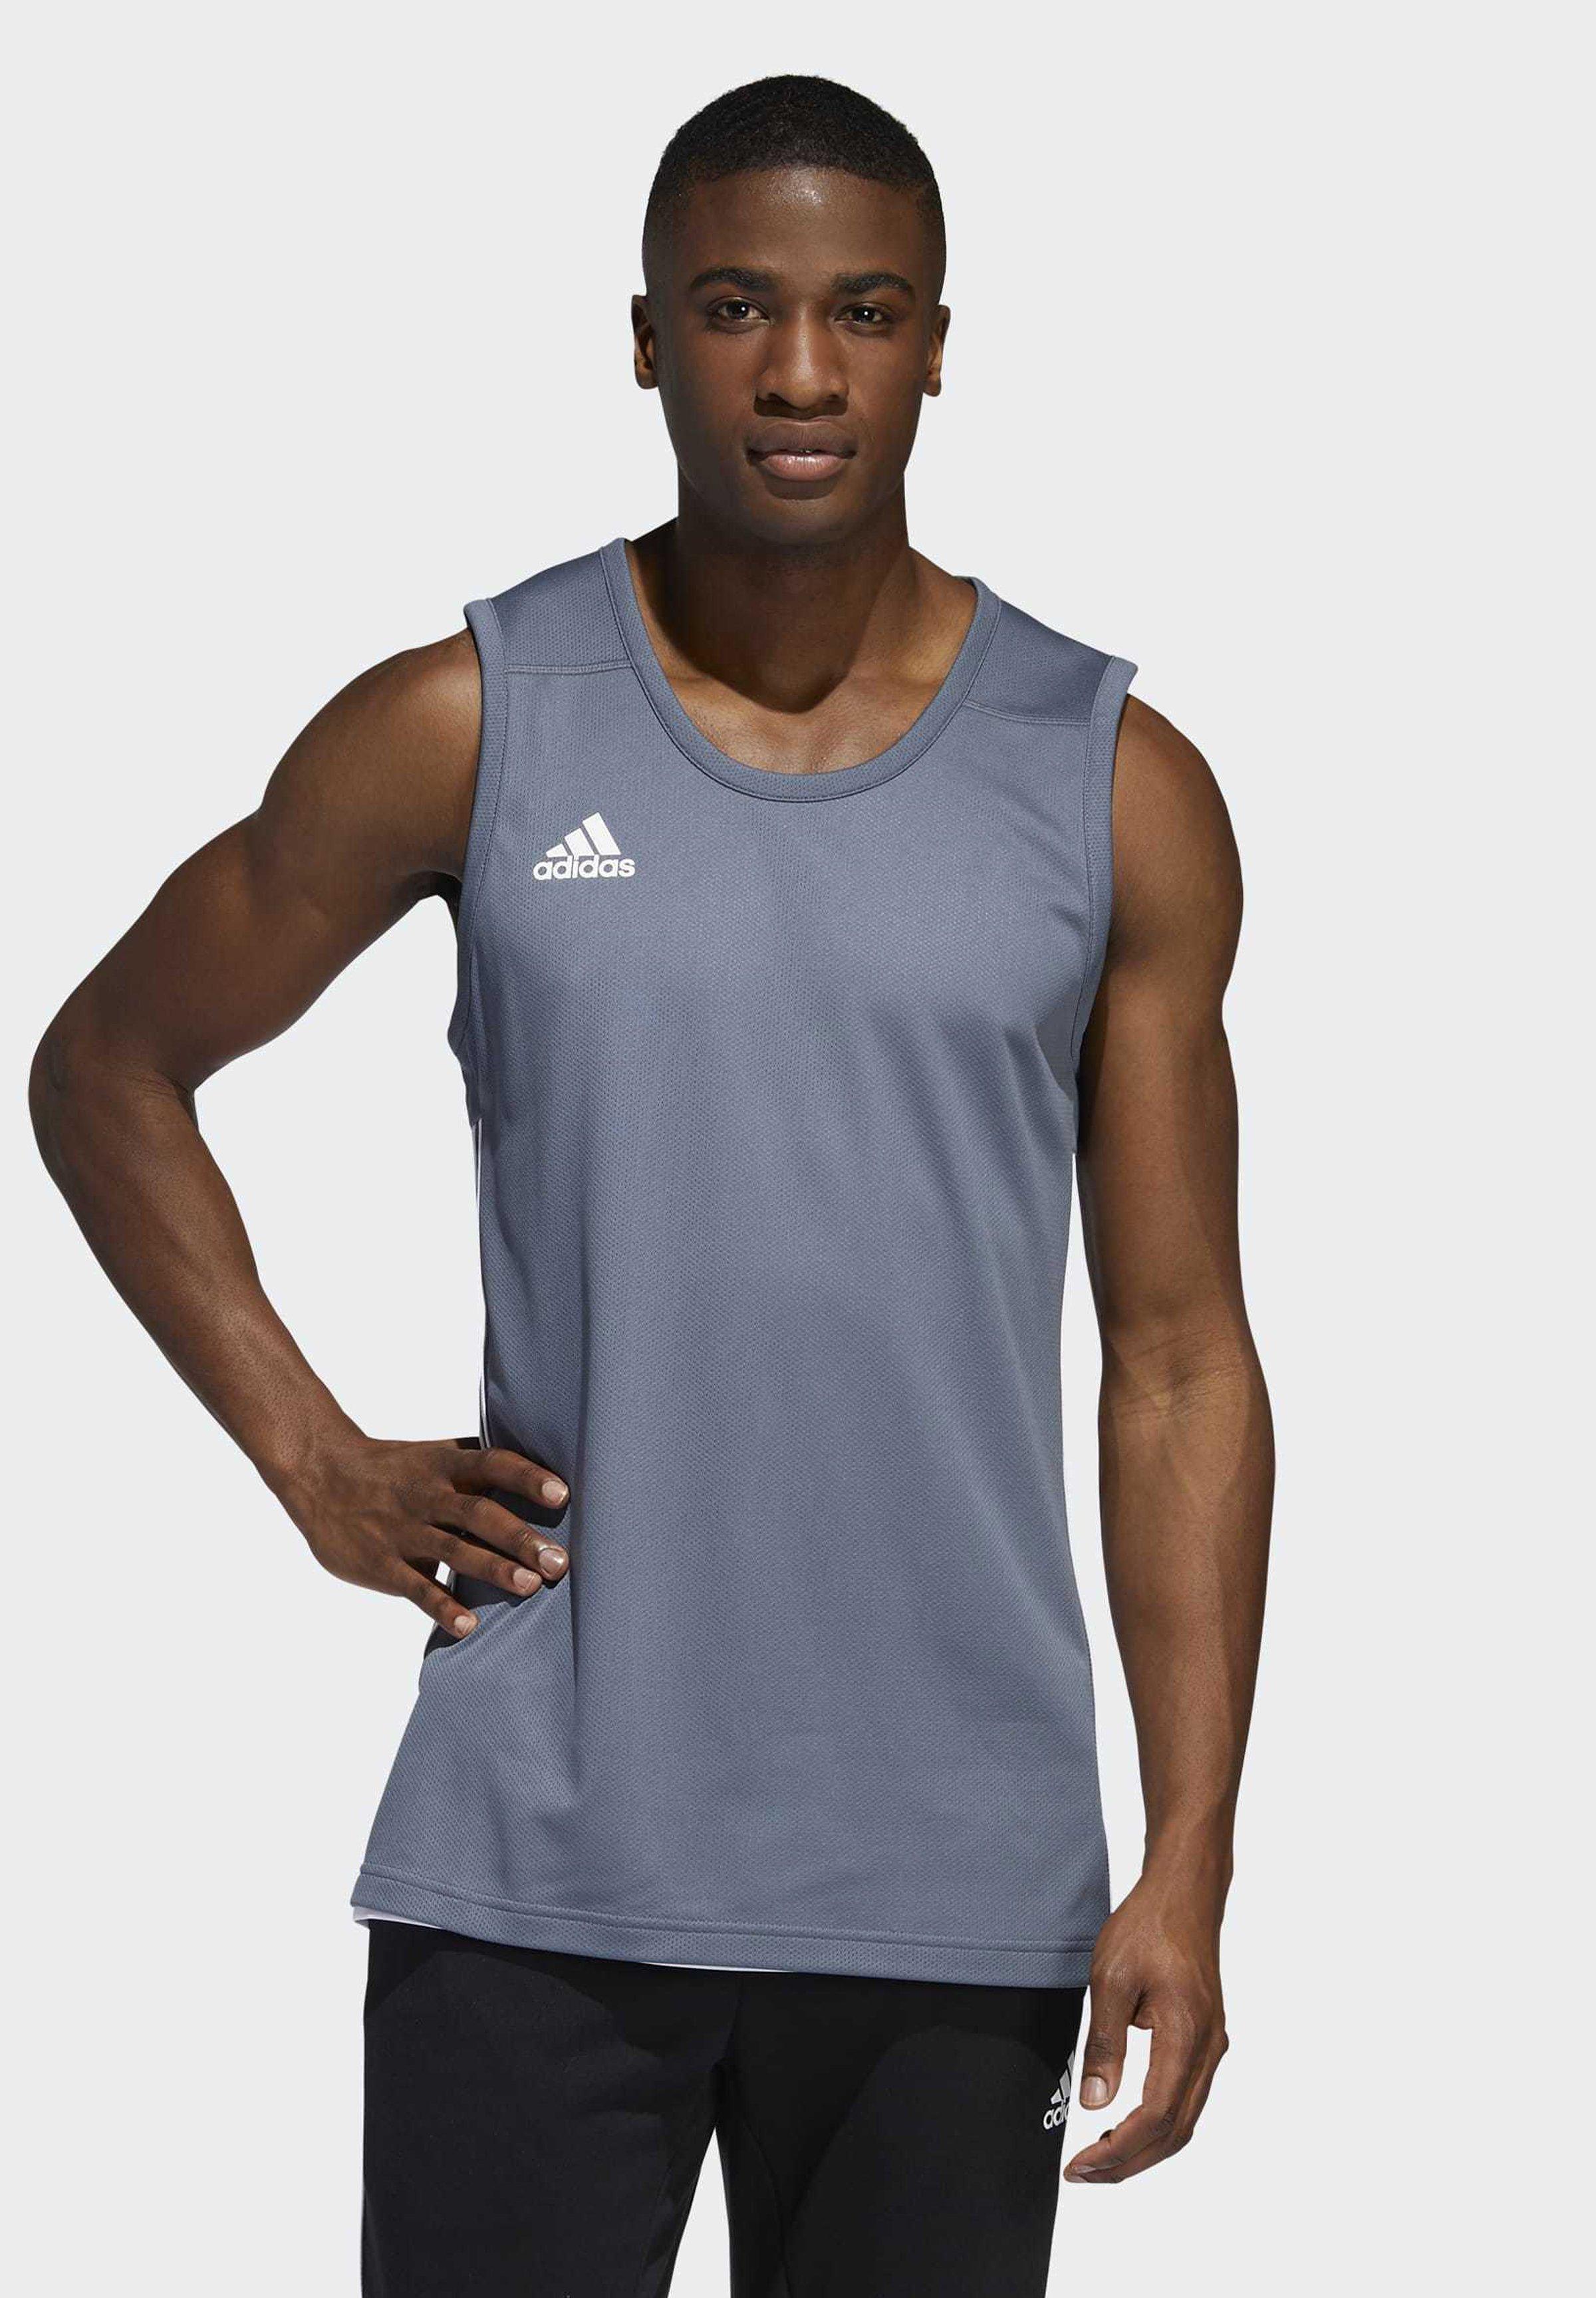 Men 3G SPEED REVERSIBLE BASKETBALL TEAM AEROREADY PRIMEGREEN SLEEVEL - Sports shirt